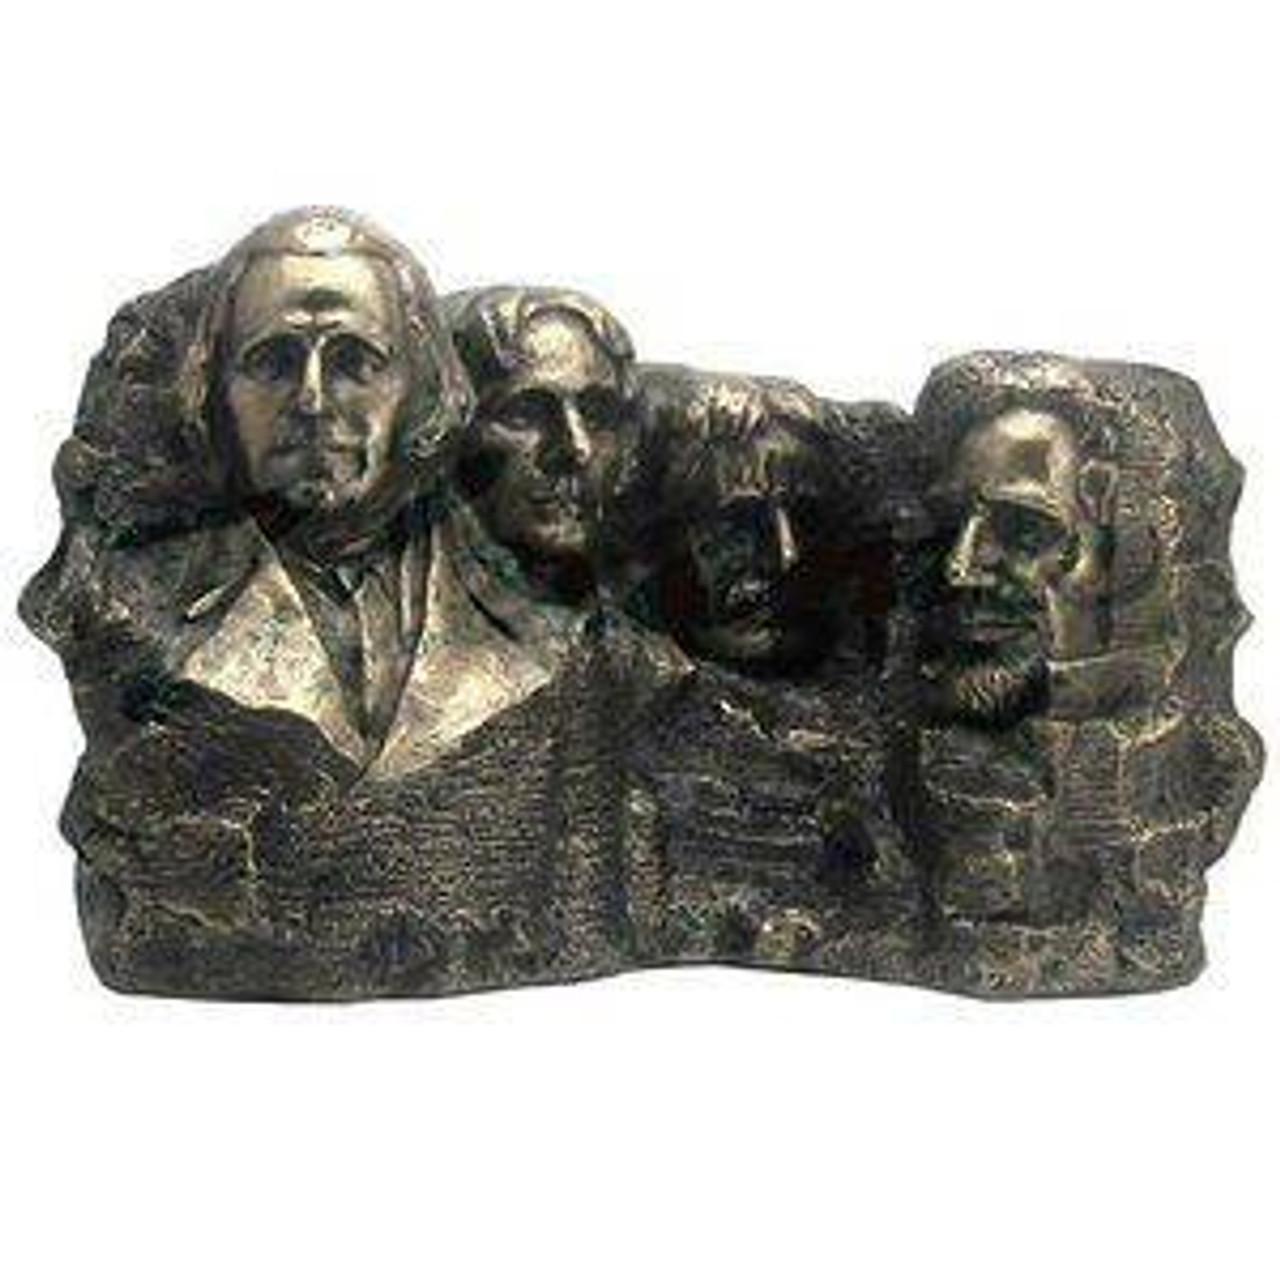 Presidents Sculptures